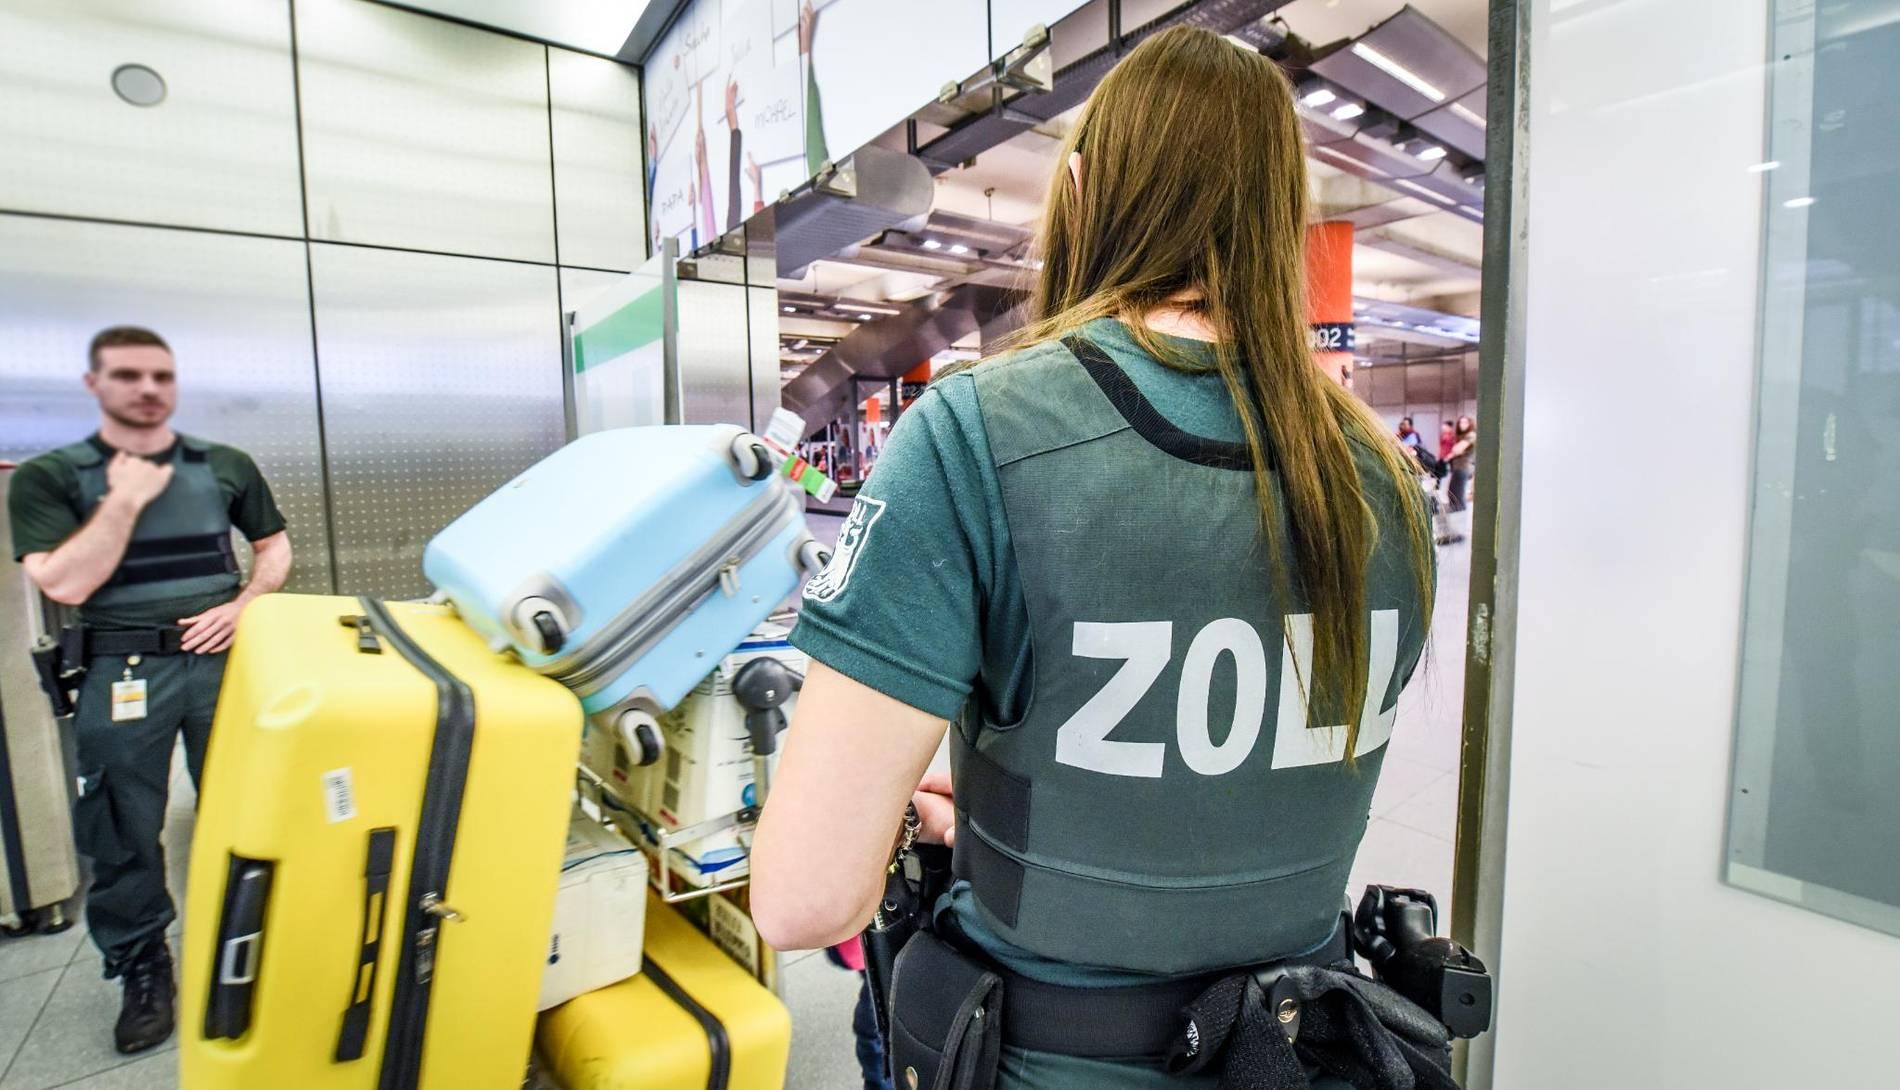 Flughafen Köln Zoll